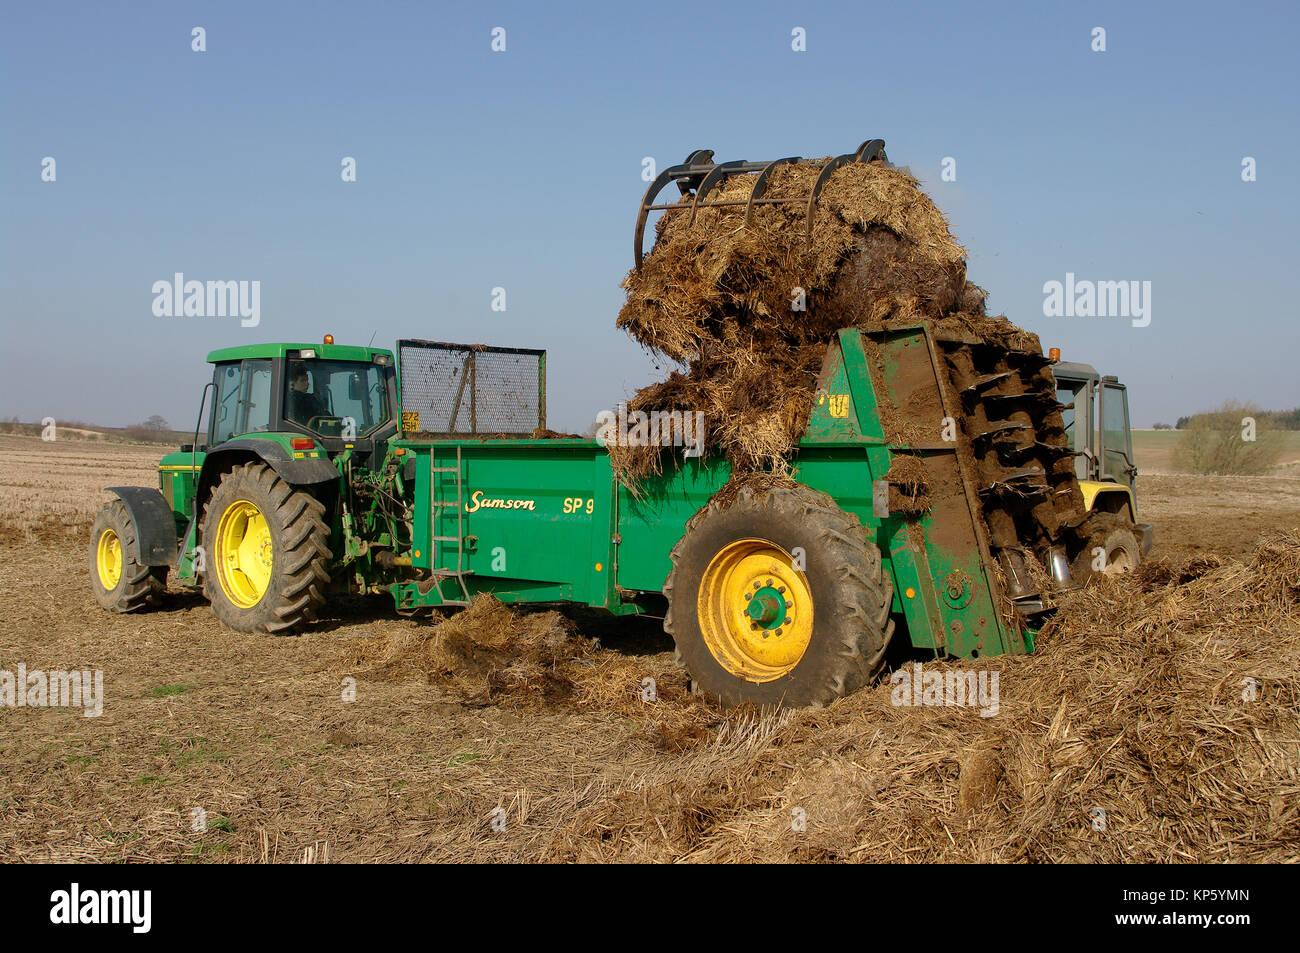 John Deere Spreaders Lawn Tractor : Spreader stock photos images alamy